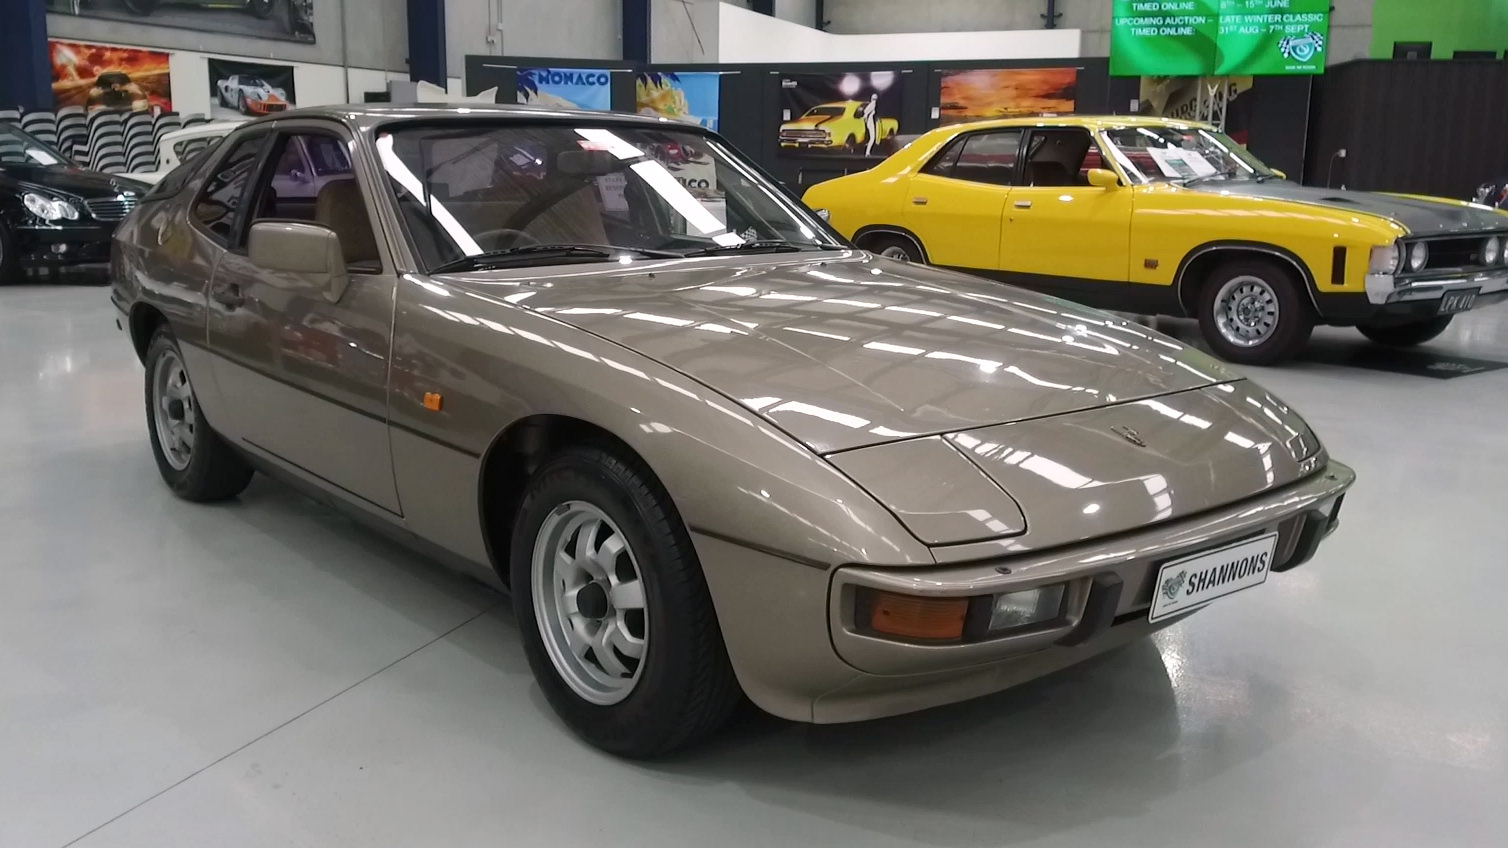 1981 Porsche 924 Coupe - 2021 Shannons Winter Timed Online Auction